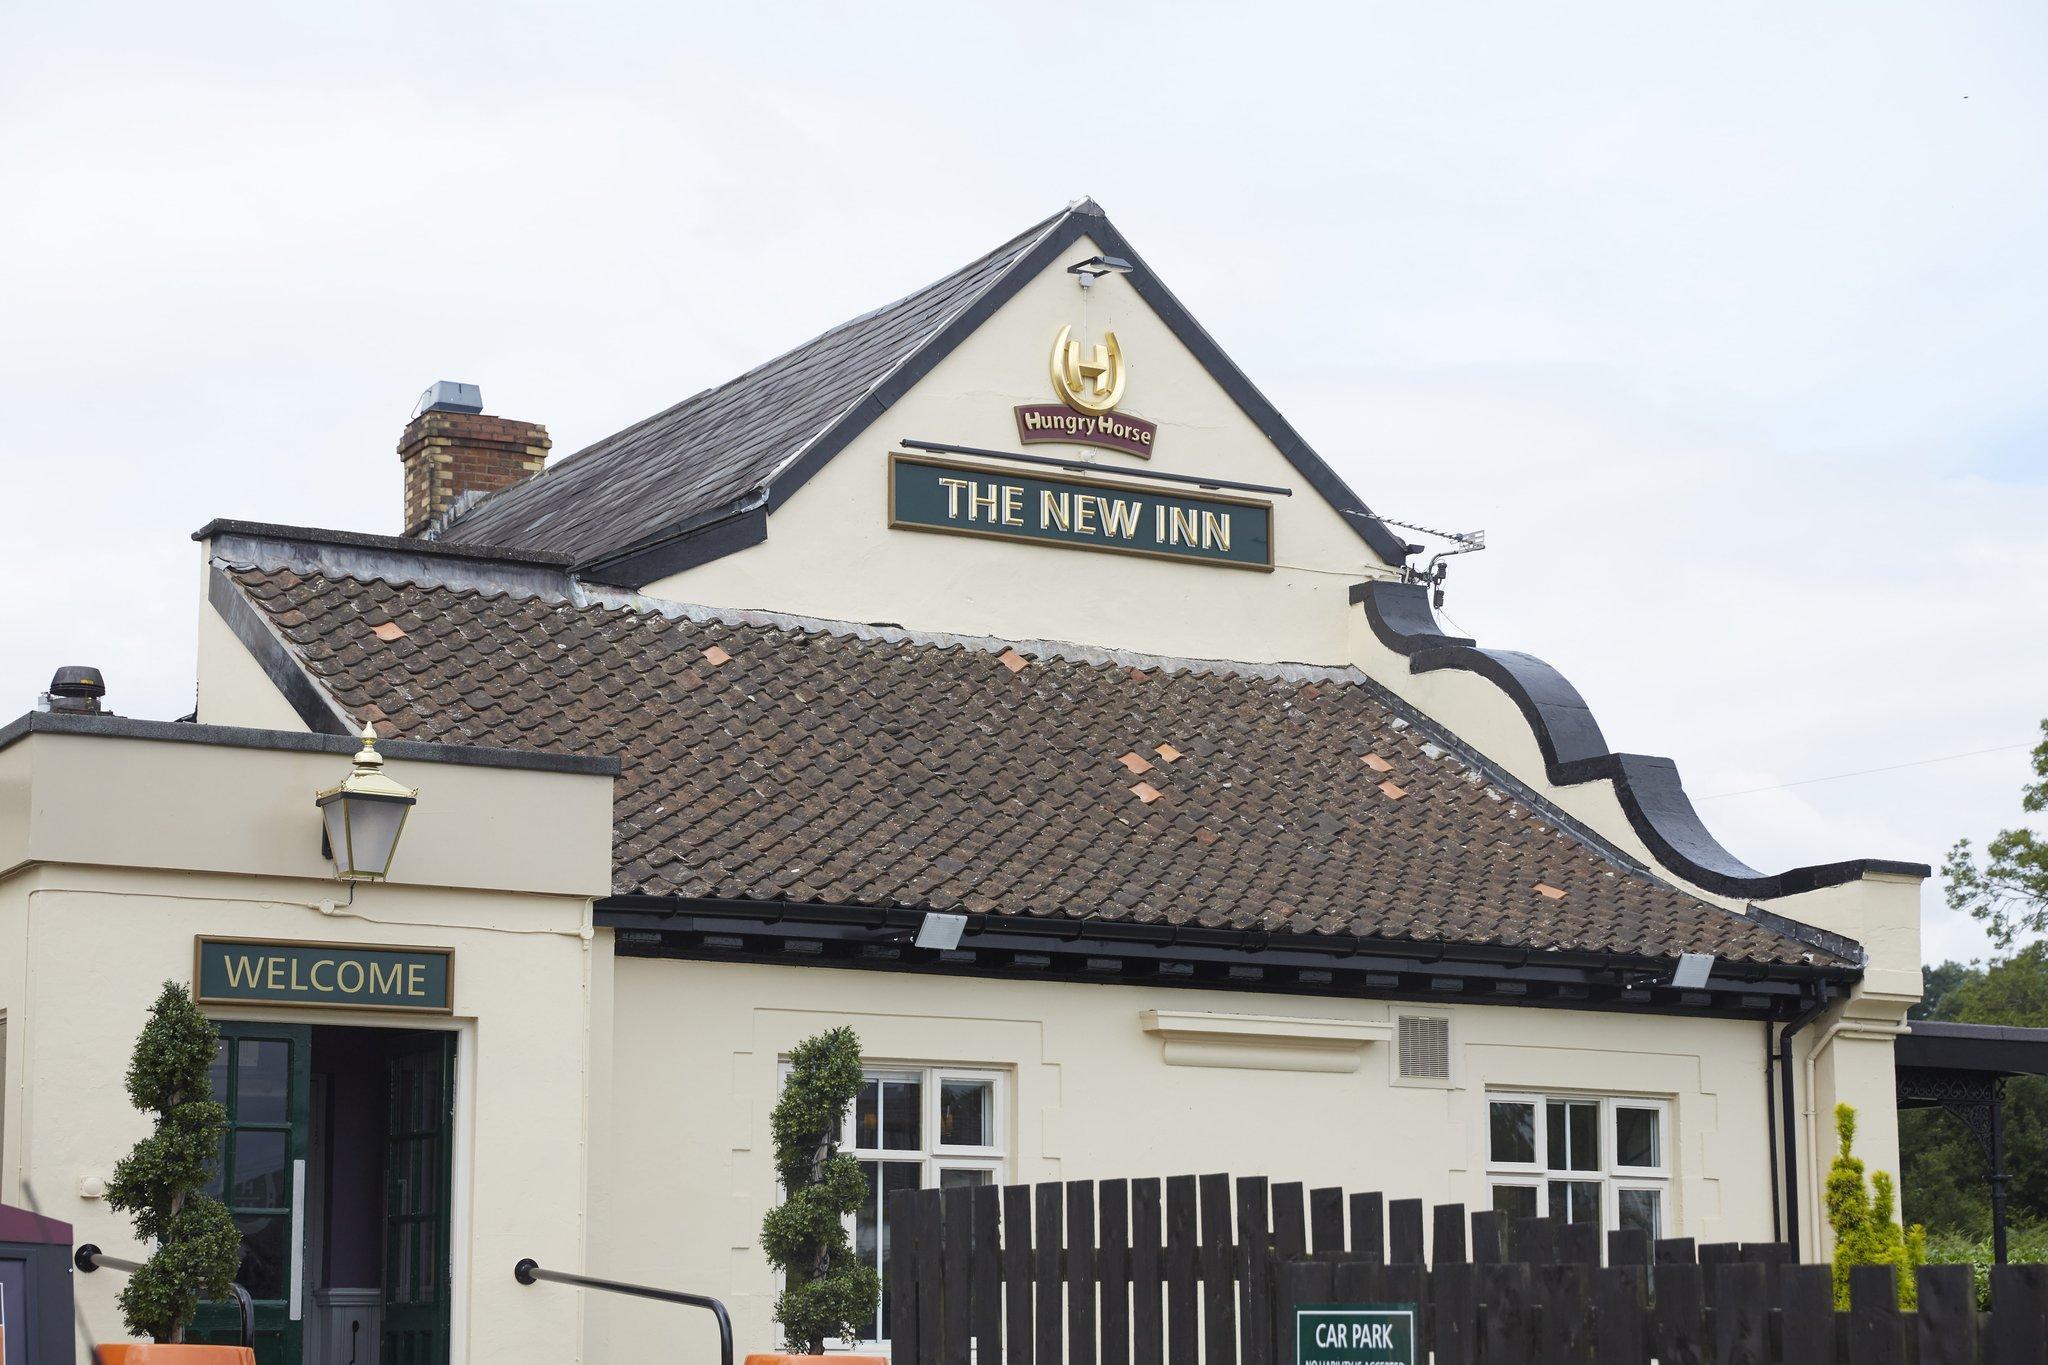 New Inn Hotel by Good Night Inns, Newport